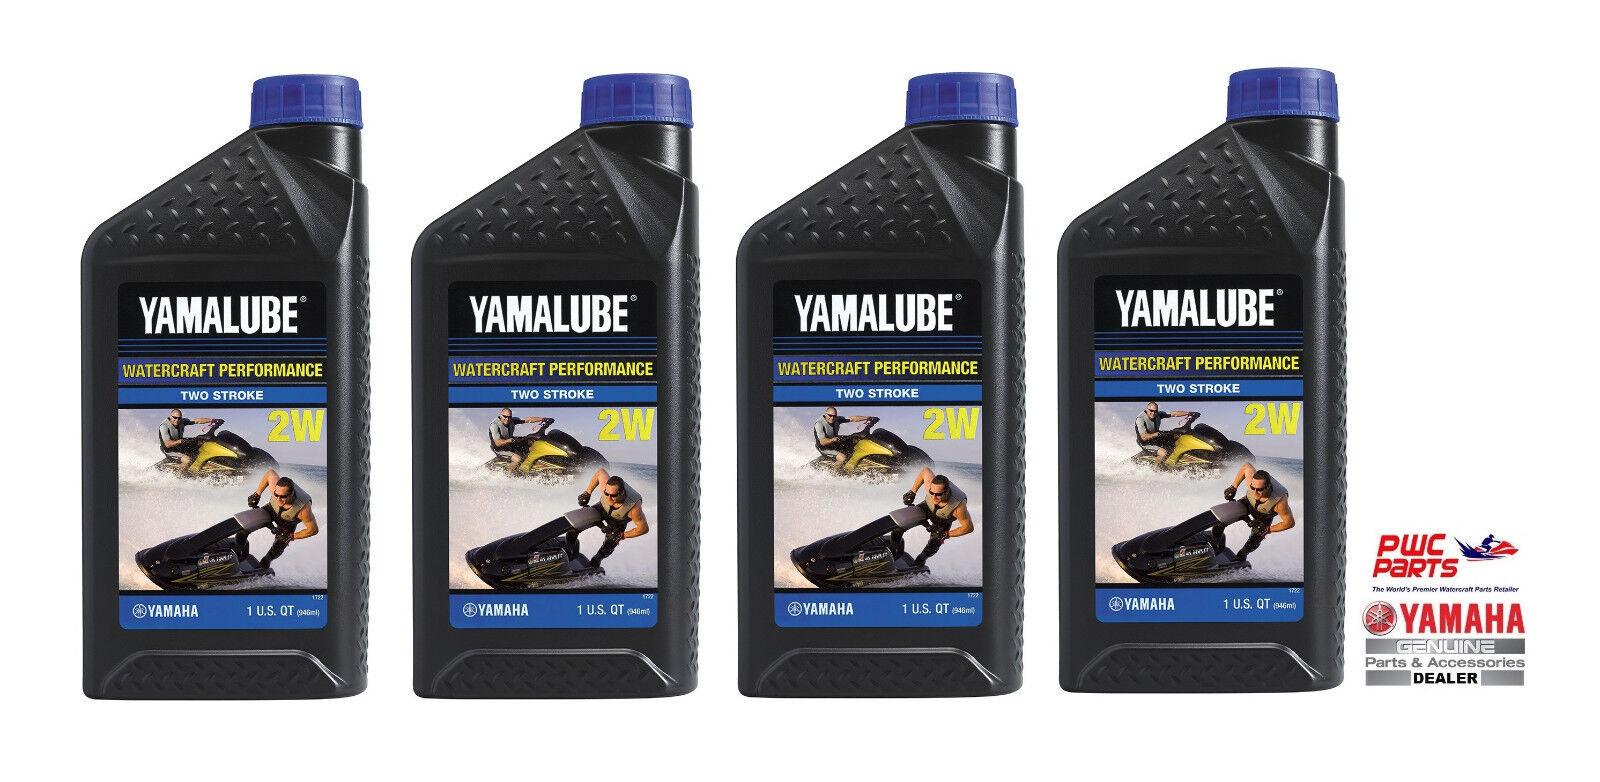 YAMALUBE 2W Watercraft 2-Stroke Engine Oil LUB-2STRK-W1-12 Quantity 4= 1 Gallon